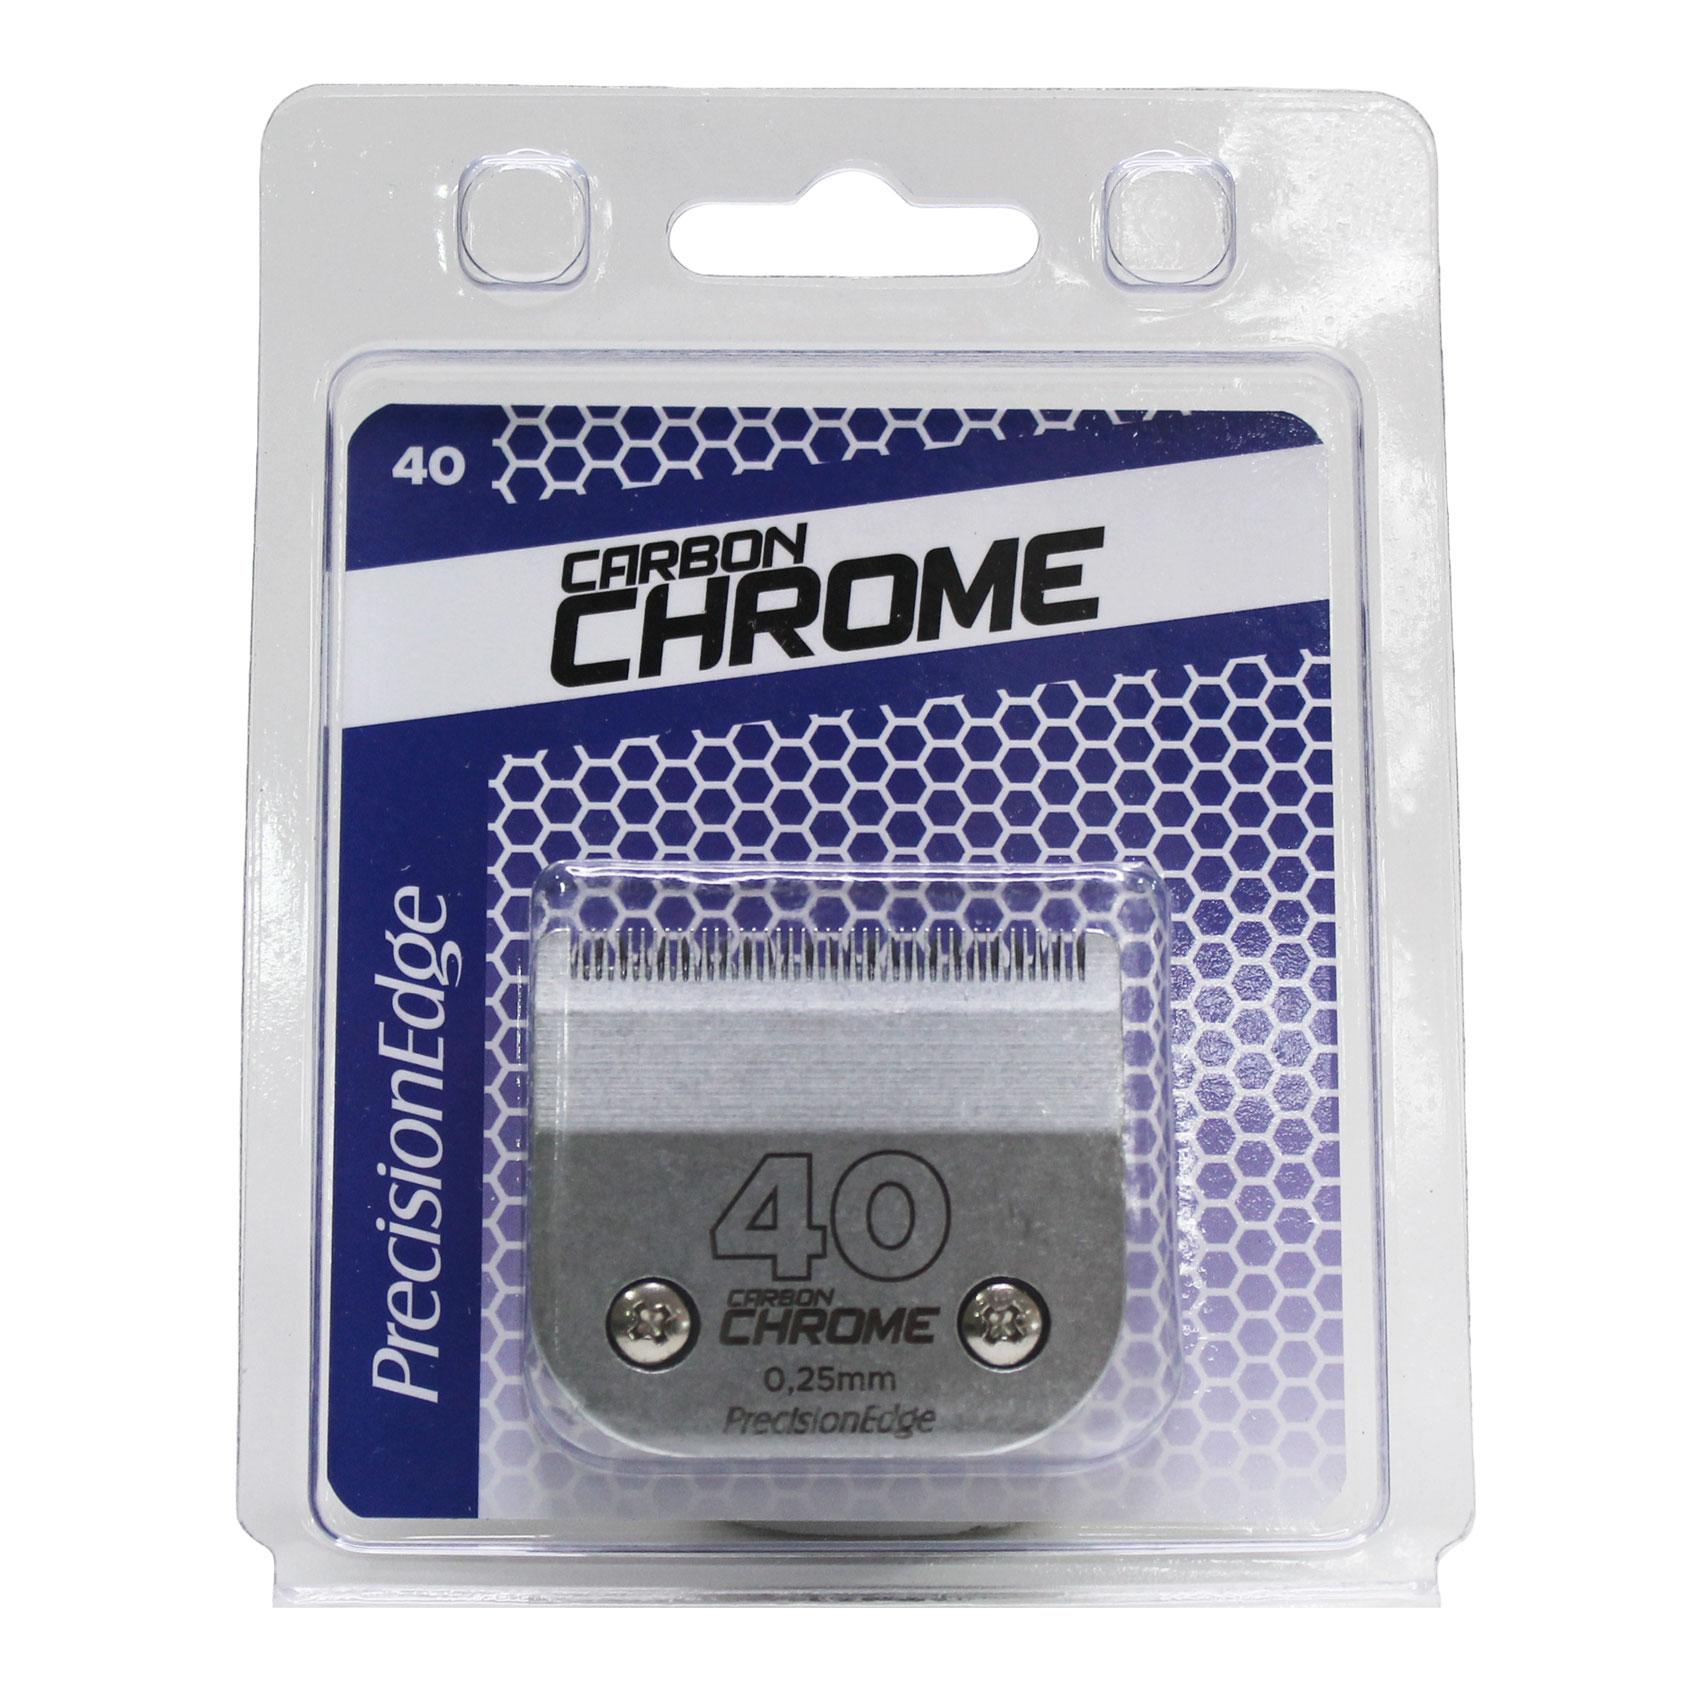 Lâmina Precision Edge Carbon Chrome 40 - 0,25mm